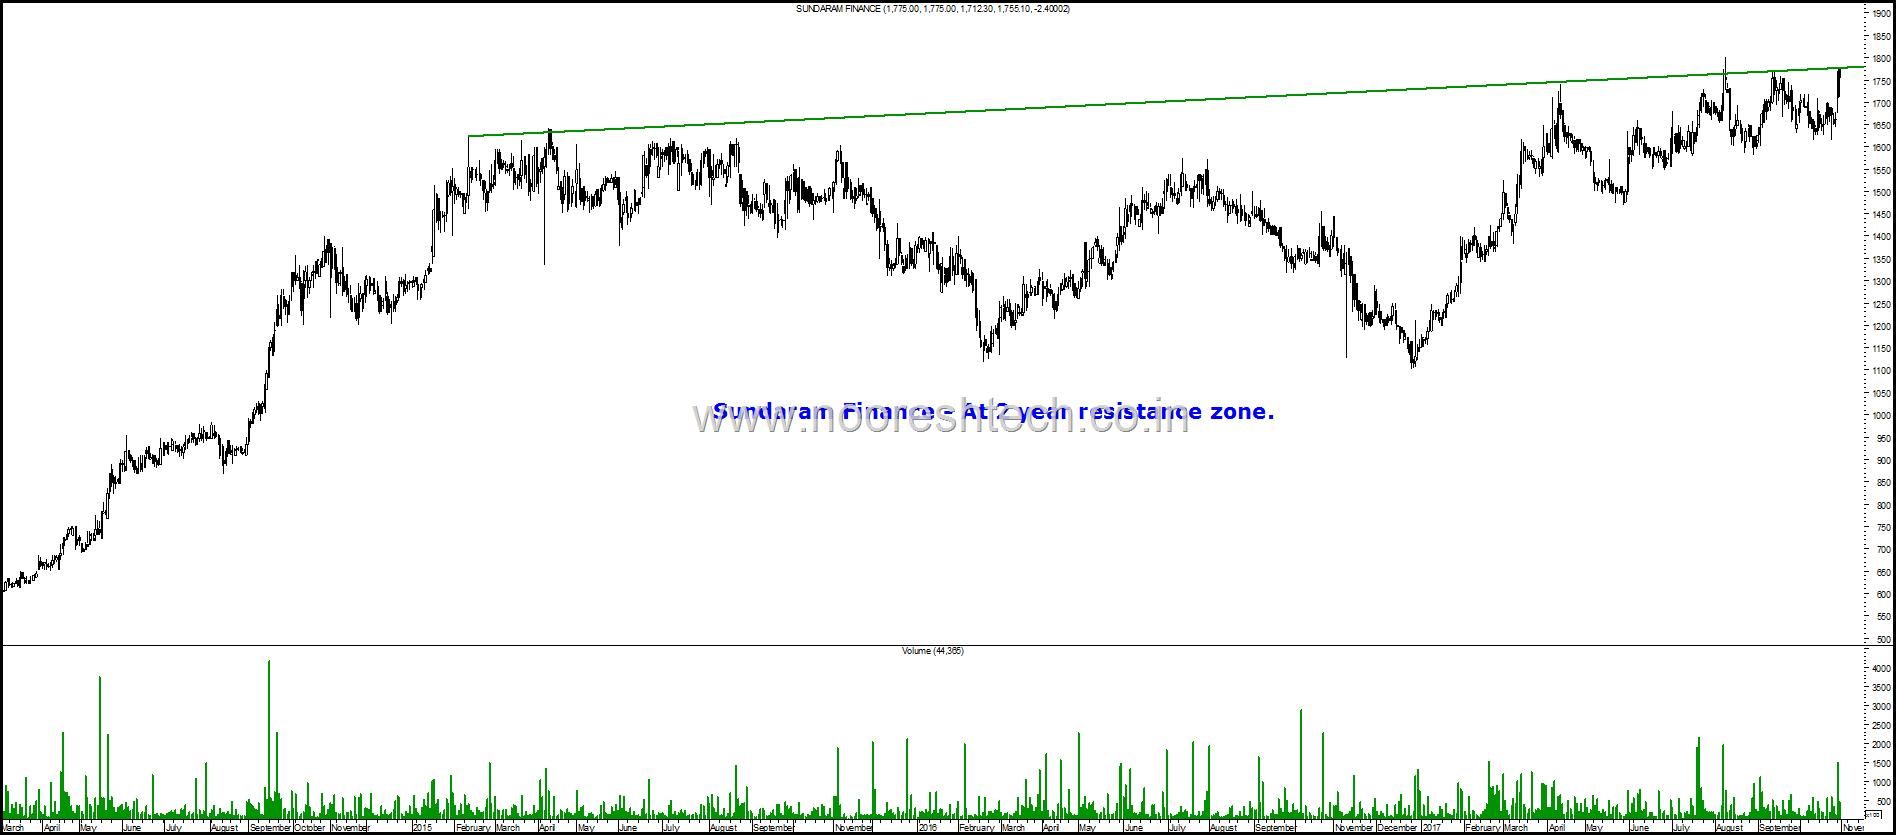 Sundaram Finance blog